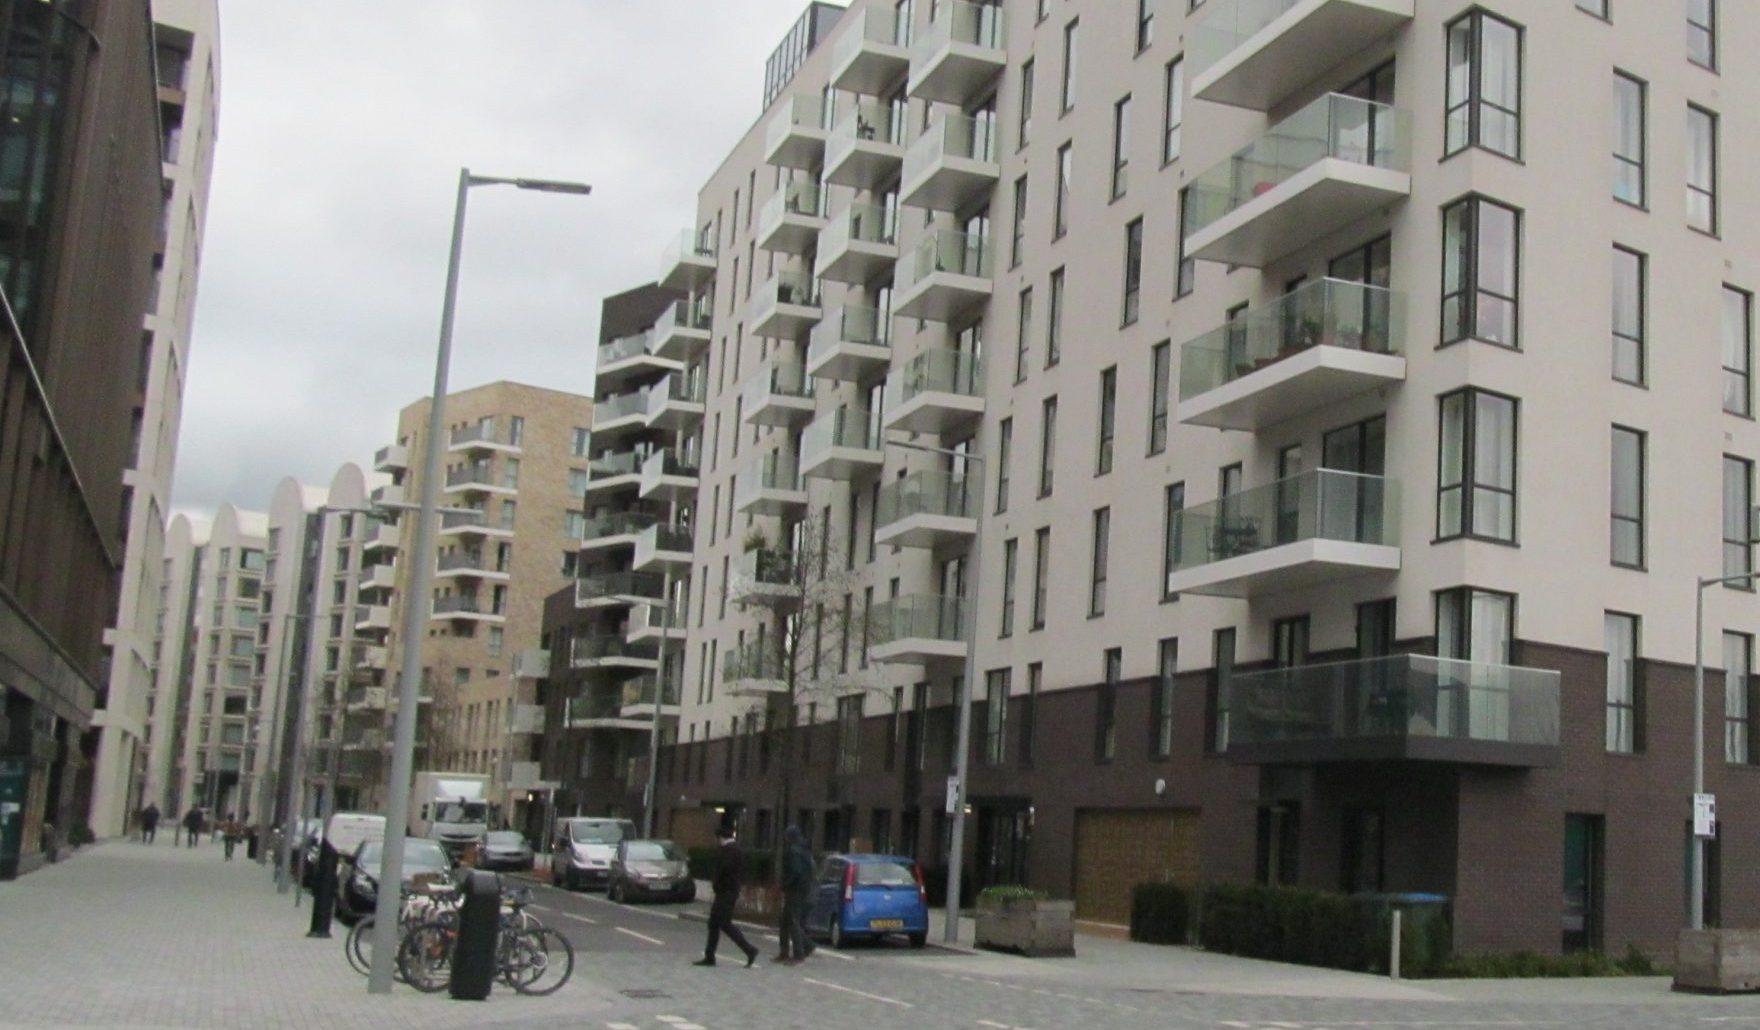 Man stabbed in Greenwich